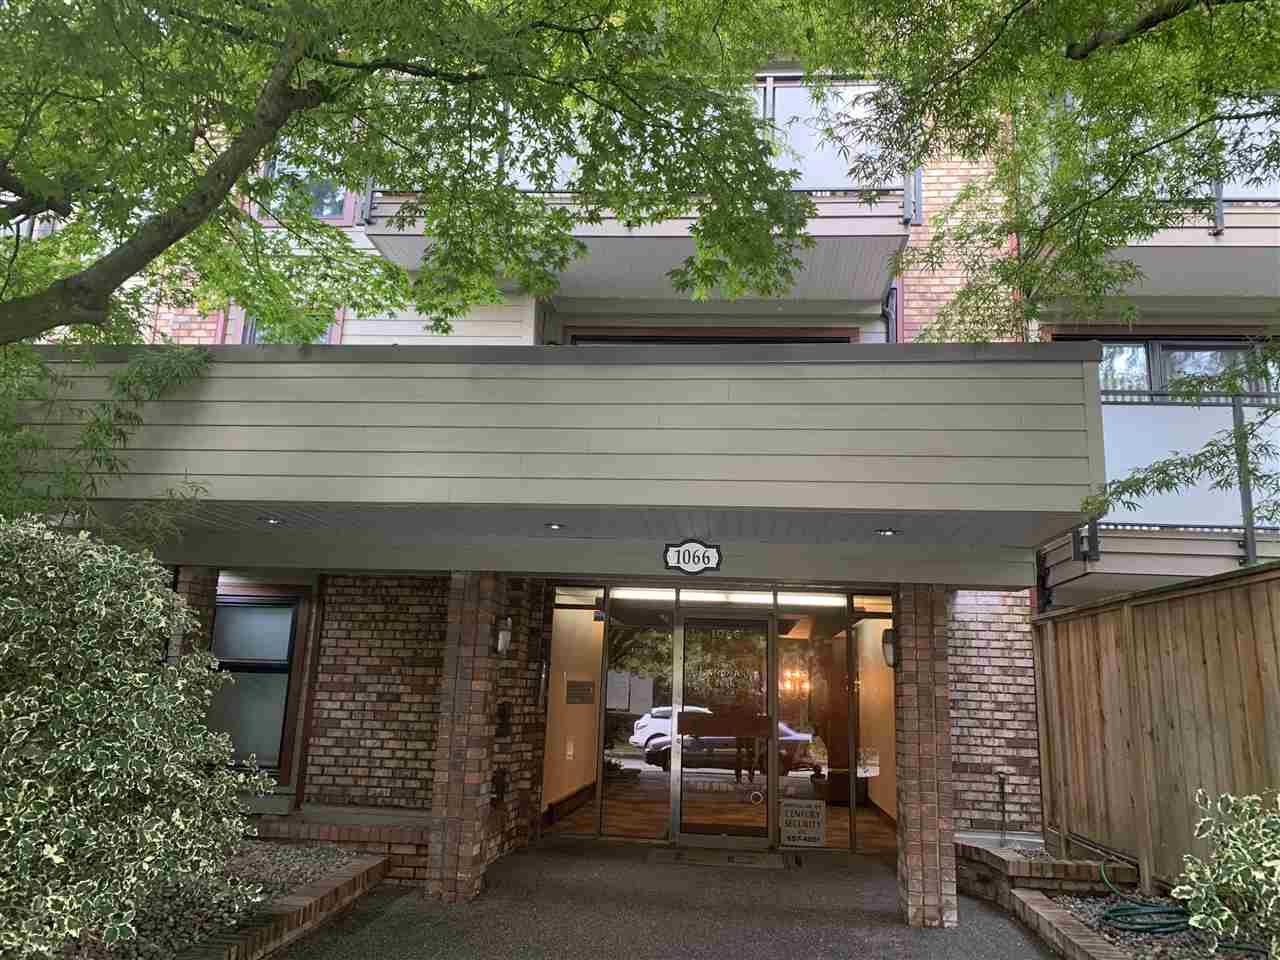 Main Photo: 213 1066 E 8TH Avenue in Vancouver: Mount Pleasant VE Condo for sale (Vancouver East)  : MLS®# R2405310